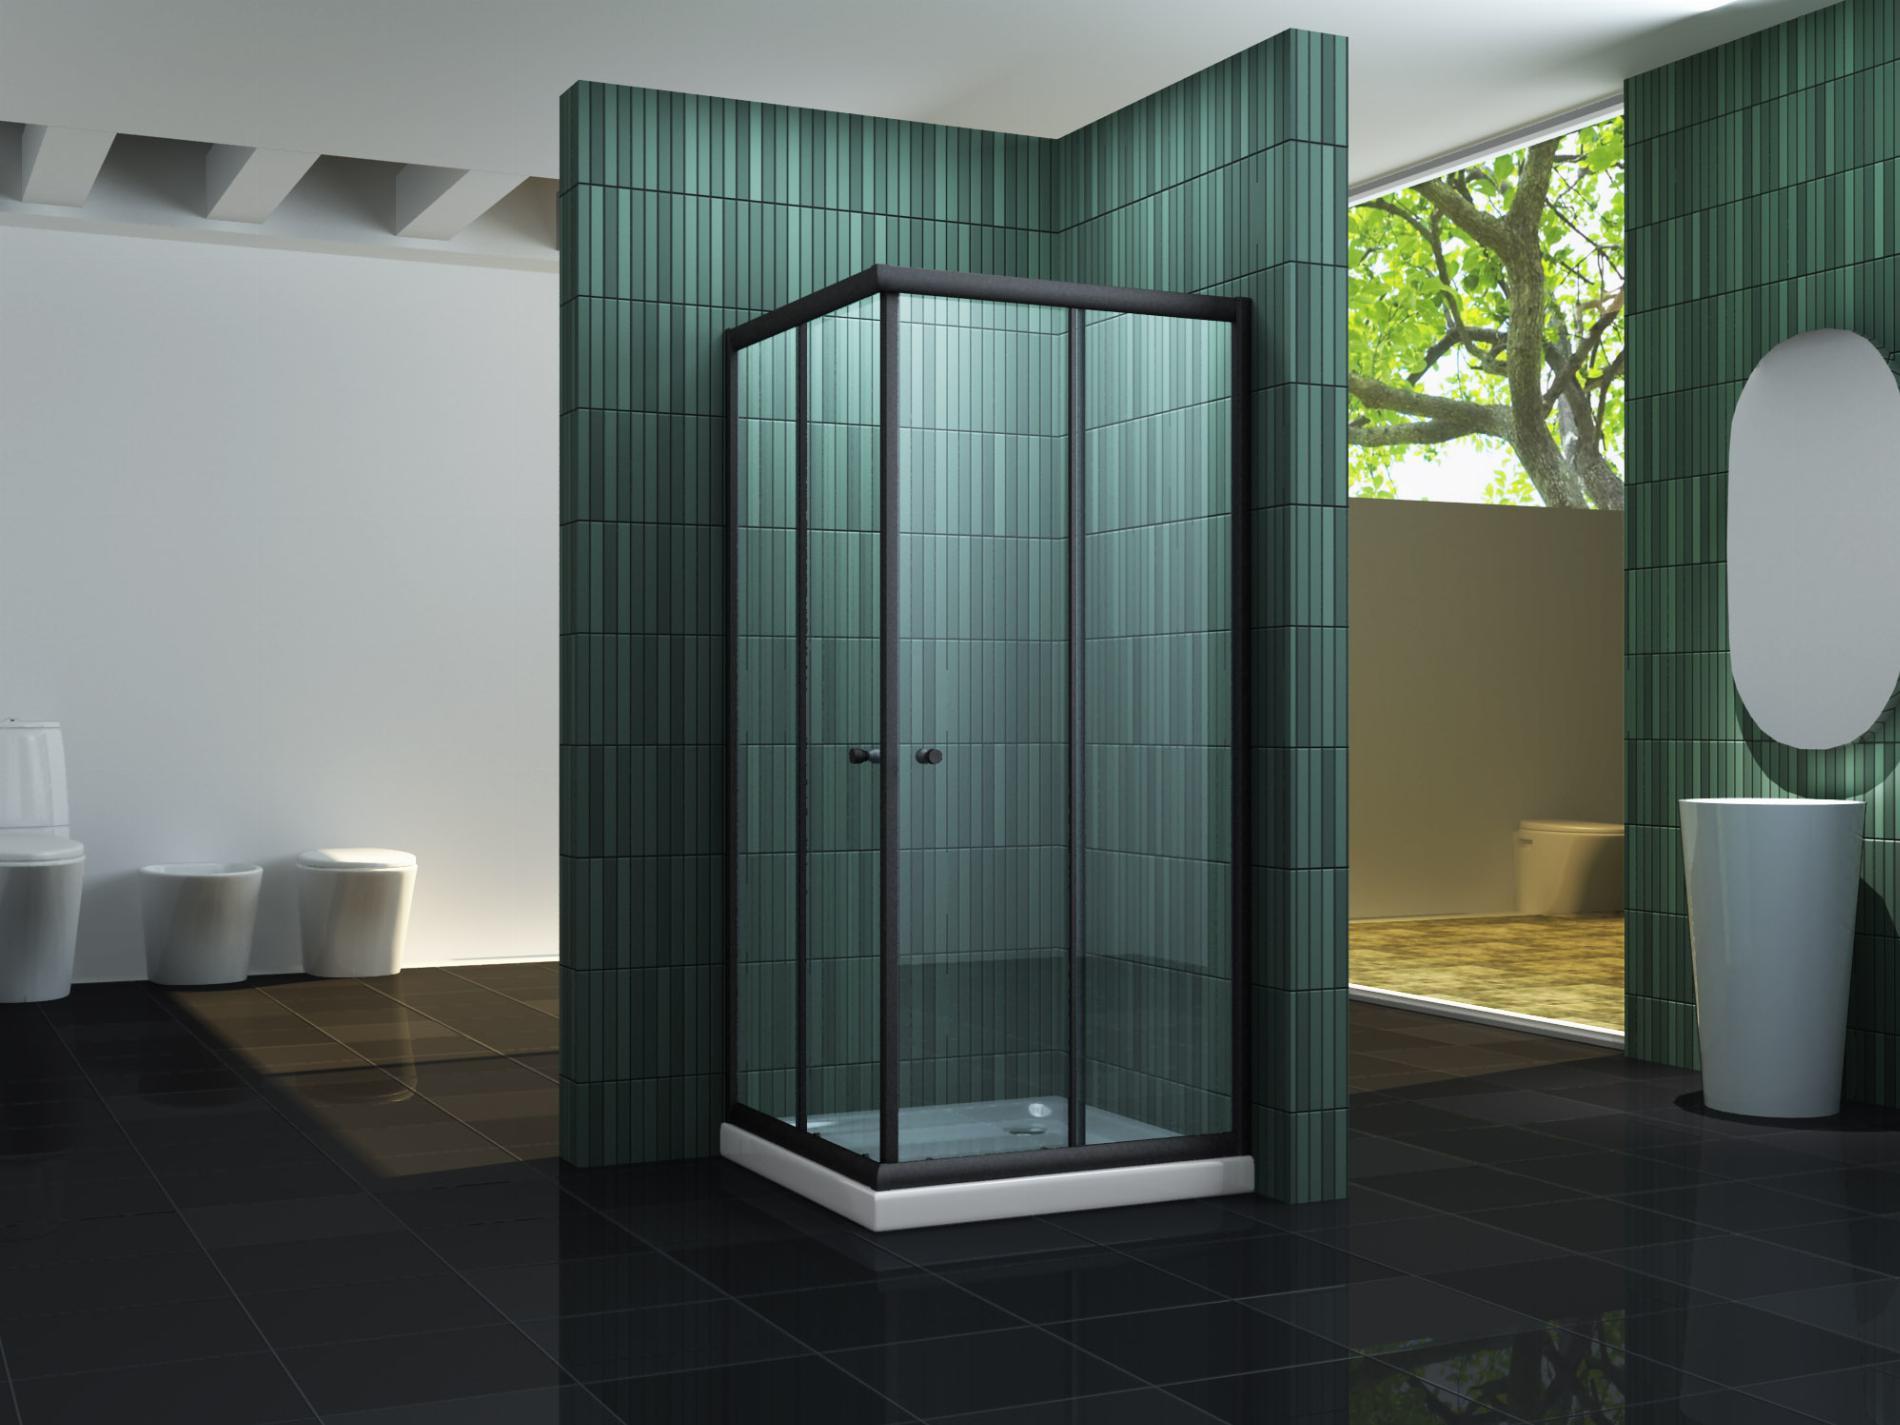 Duschkabine JUNISO-Q (schwarz) 80 x 80 x 195 cm inkl. Duschtasse